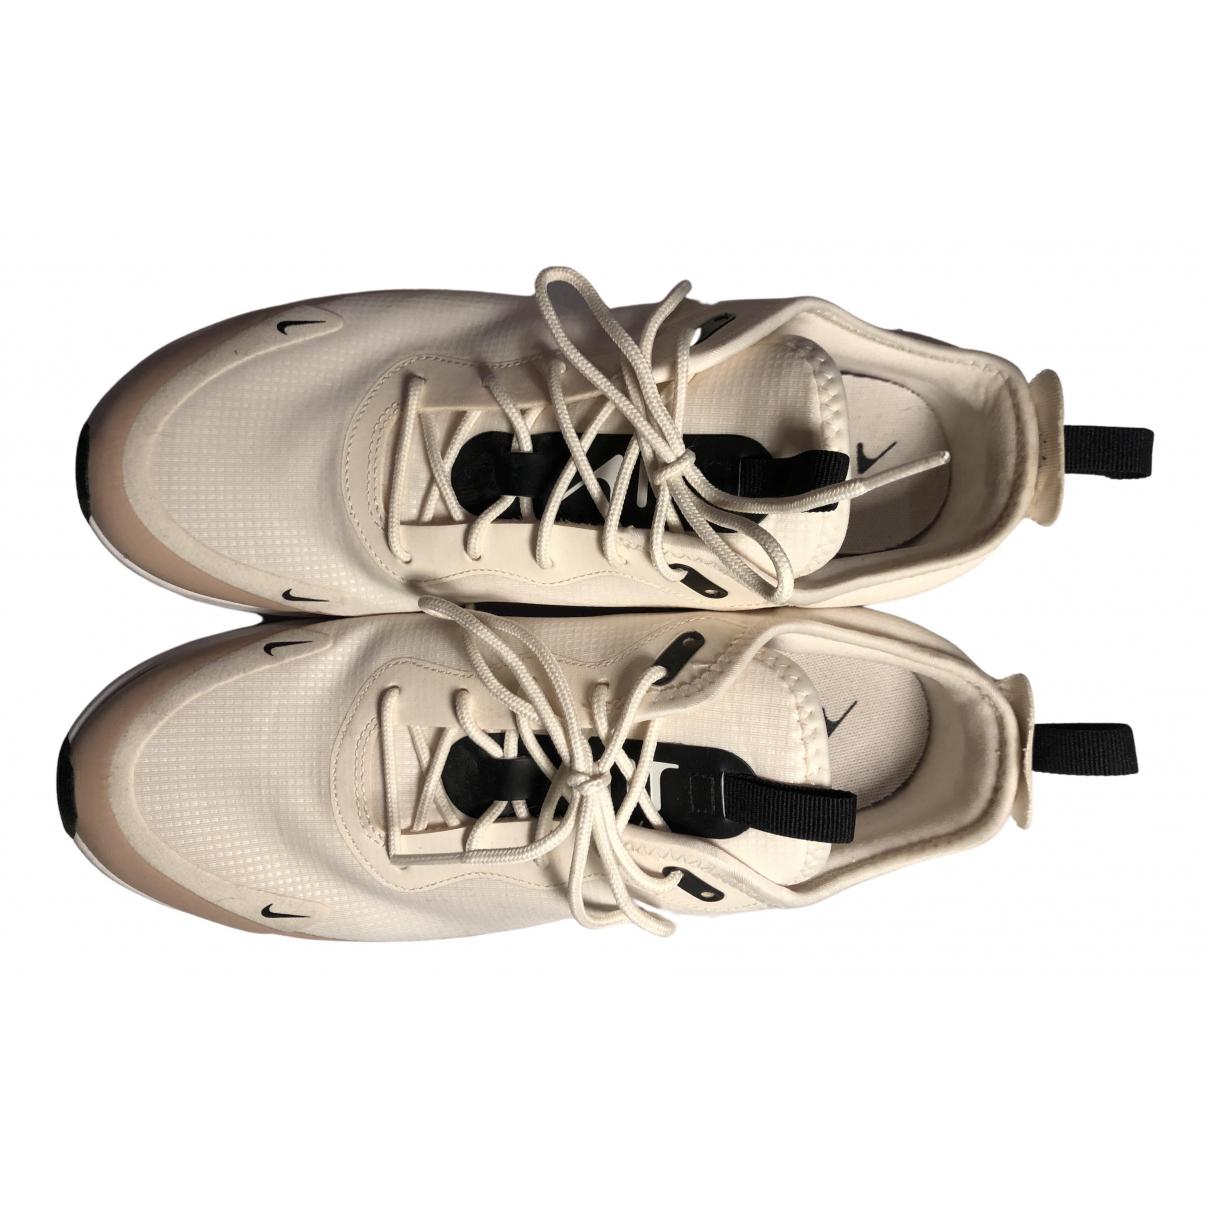 Nike Air Max  Sneakers in  Beige Kautschuk